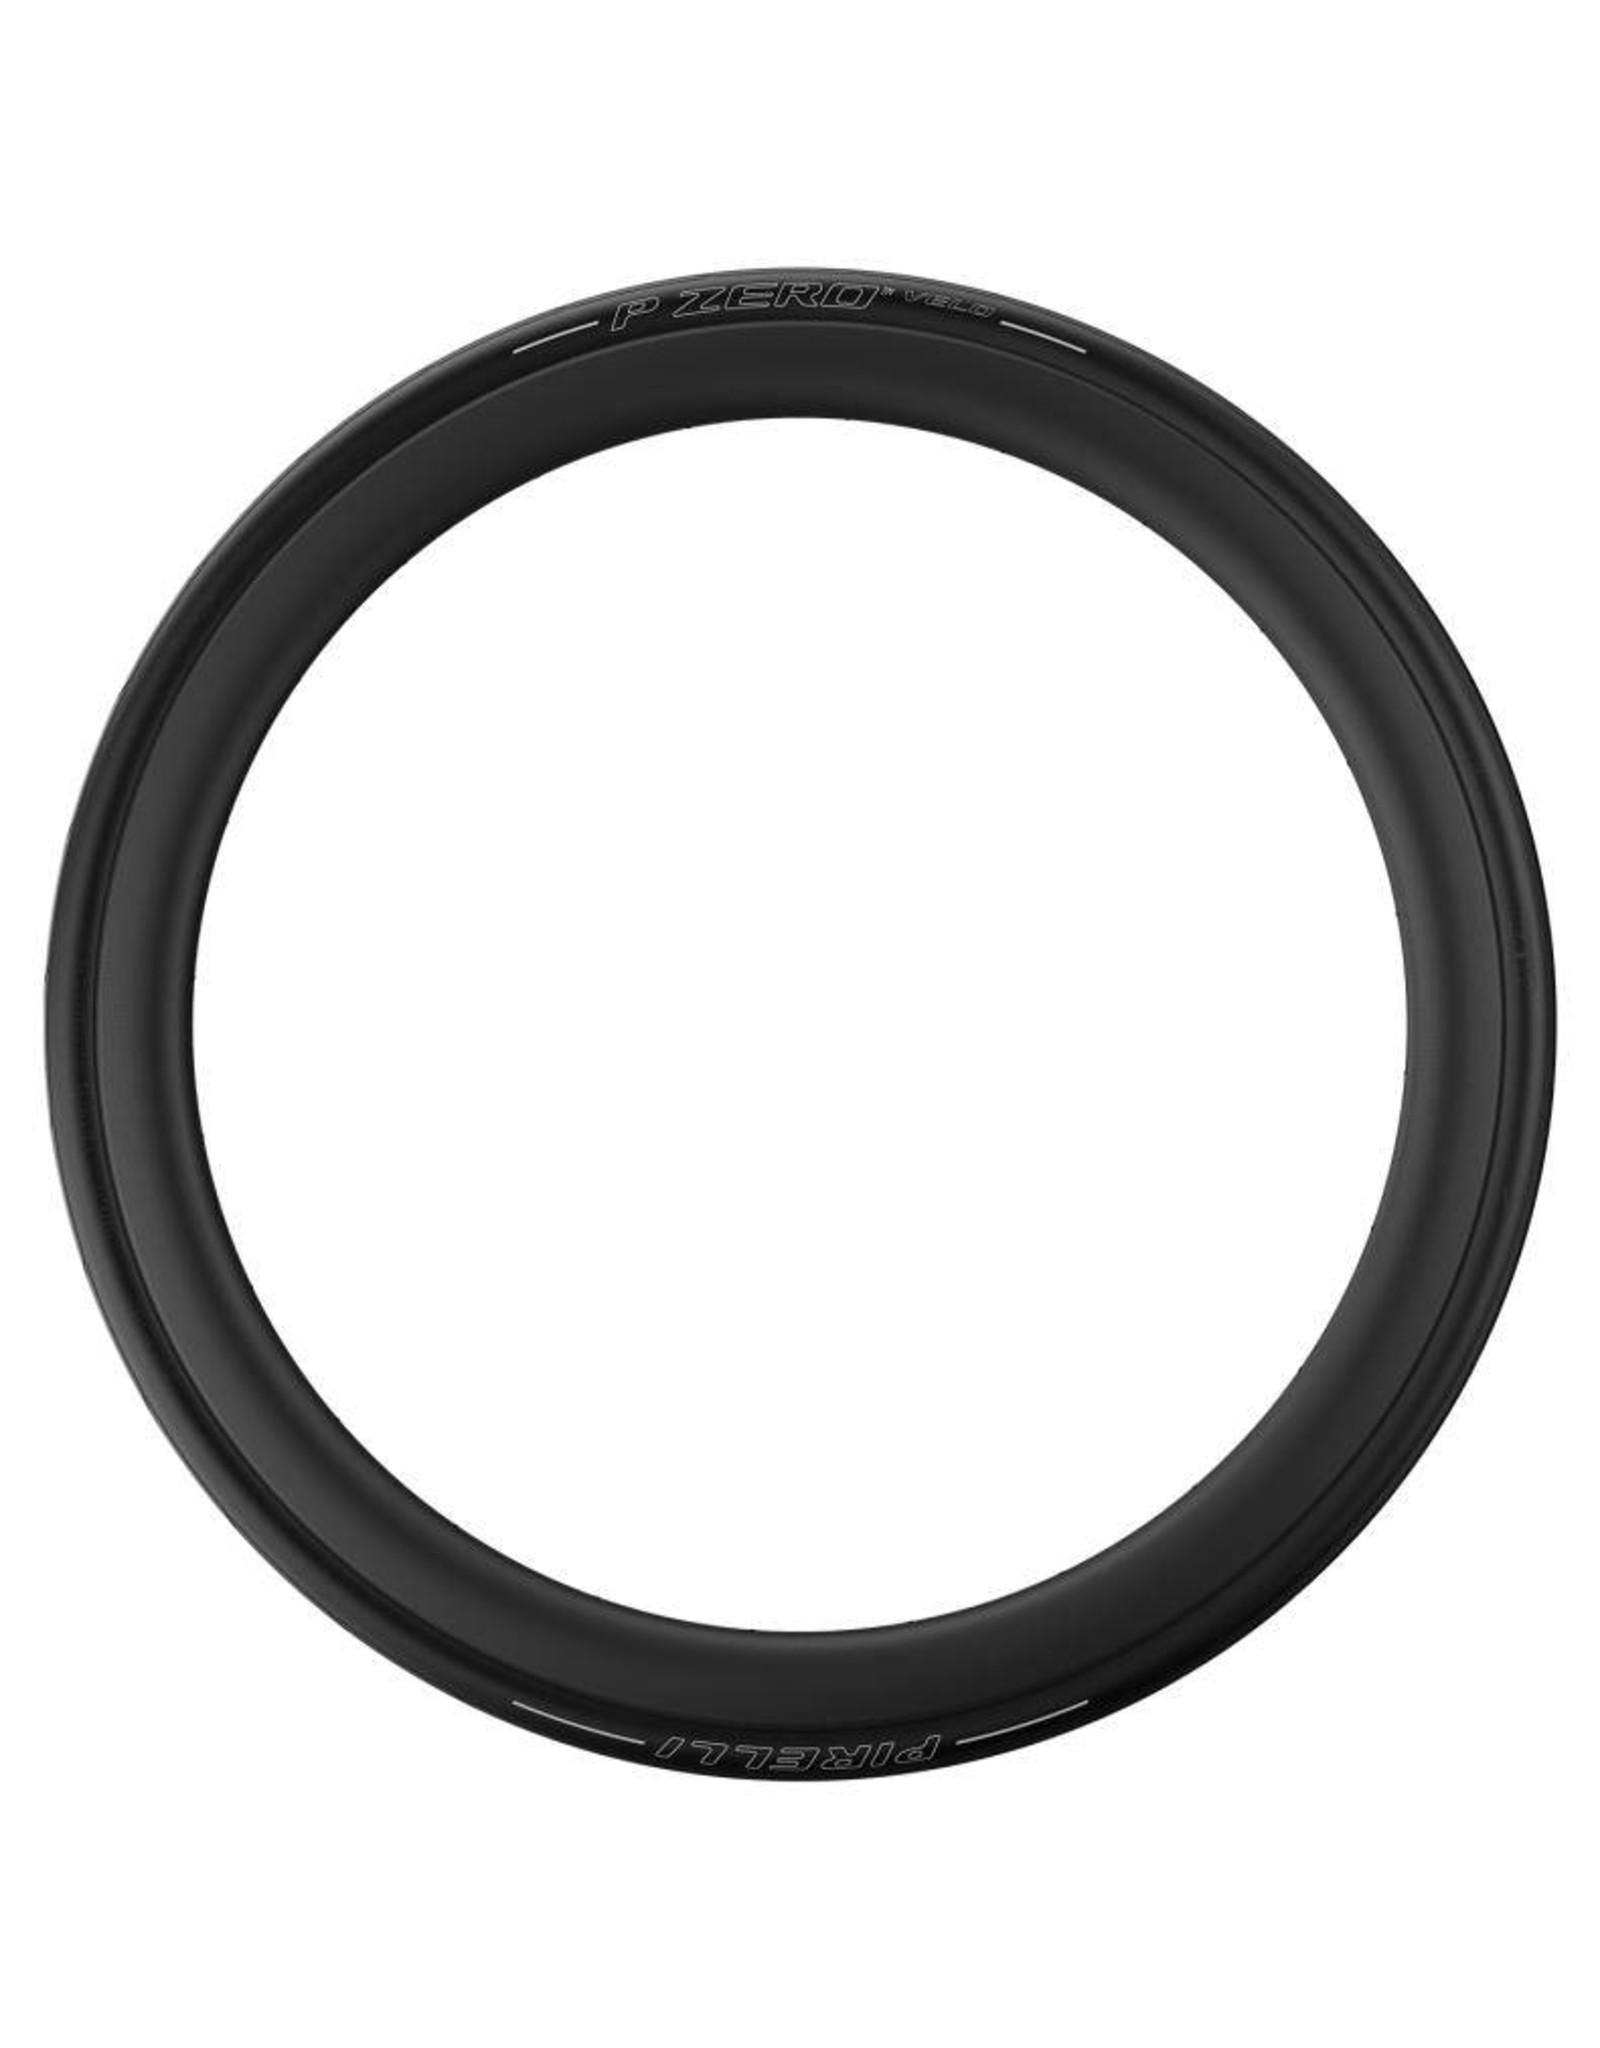 Pirelli Pirelli PZero Velo 700x28C Folding  Smartnet Silica, Aramid Fiber, 127TPI, 230g, Black